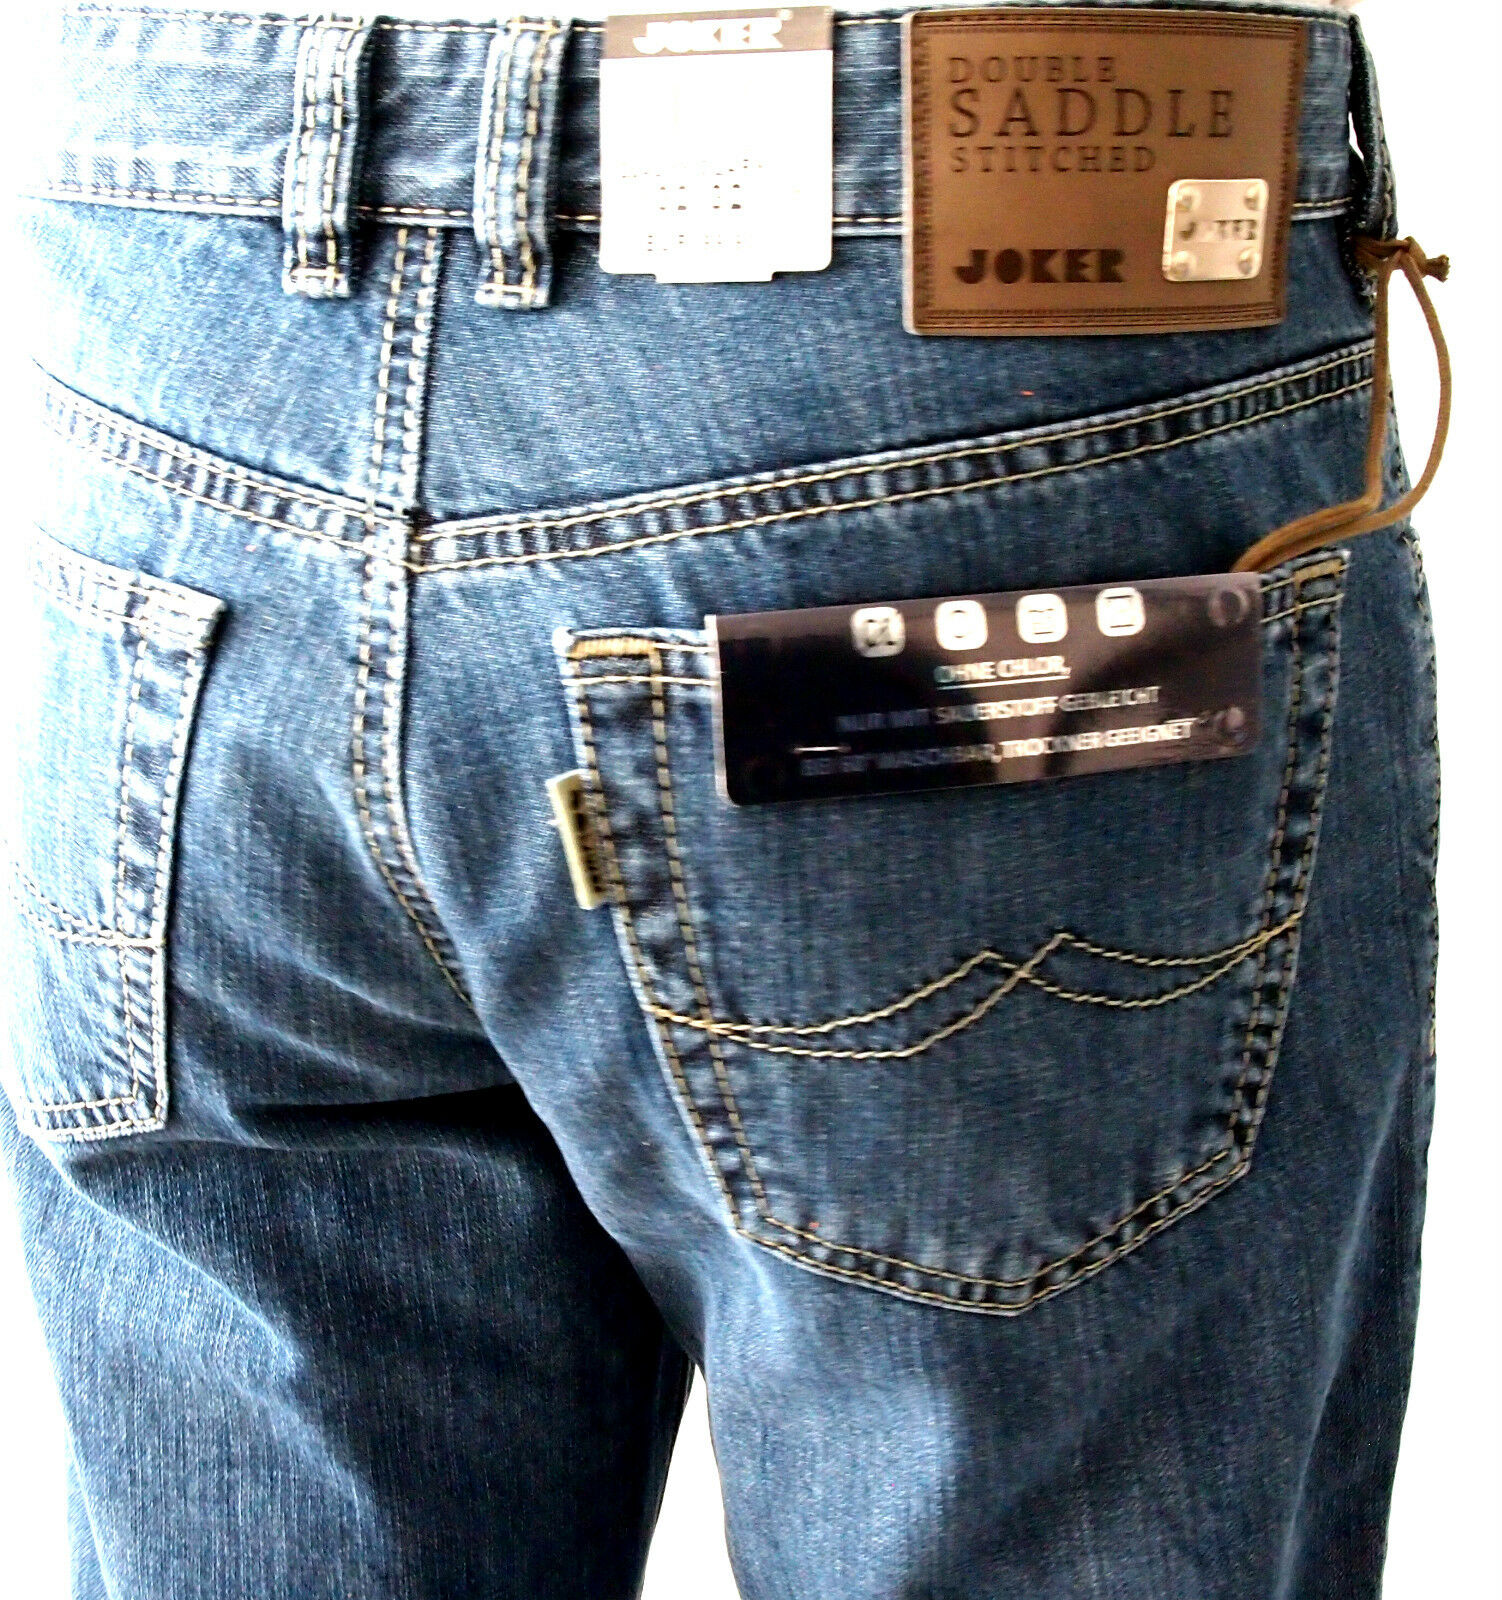 Joker Jeans 2242 55 Clark Stonewash W31 32 33 34 36 38 40 42